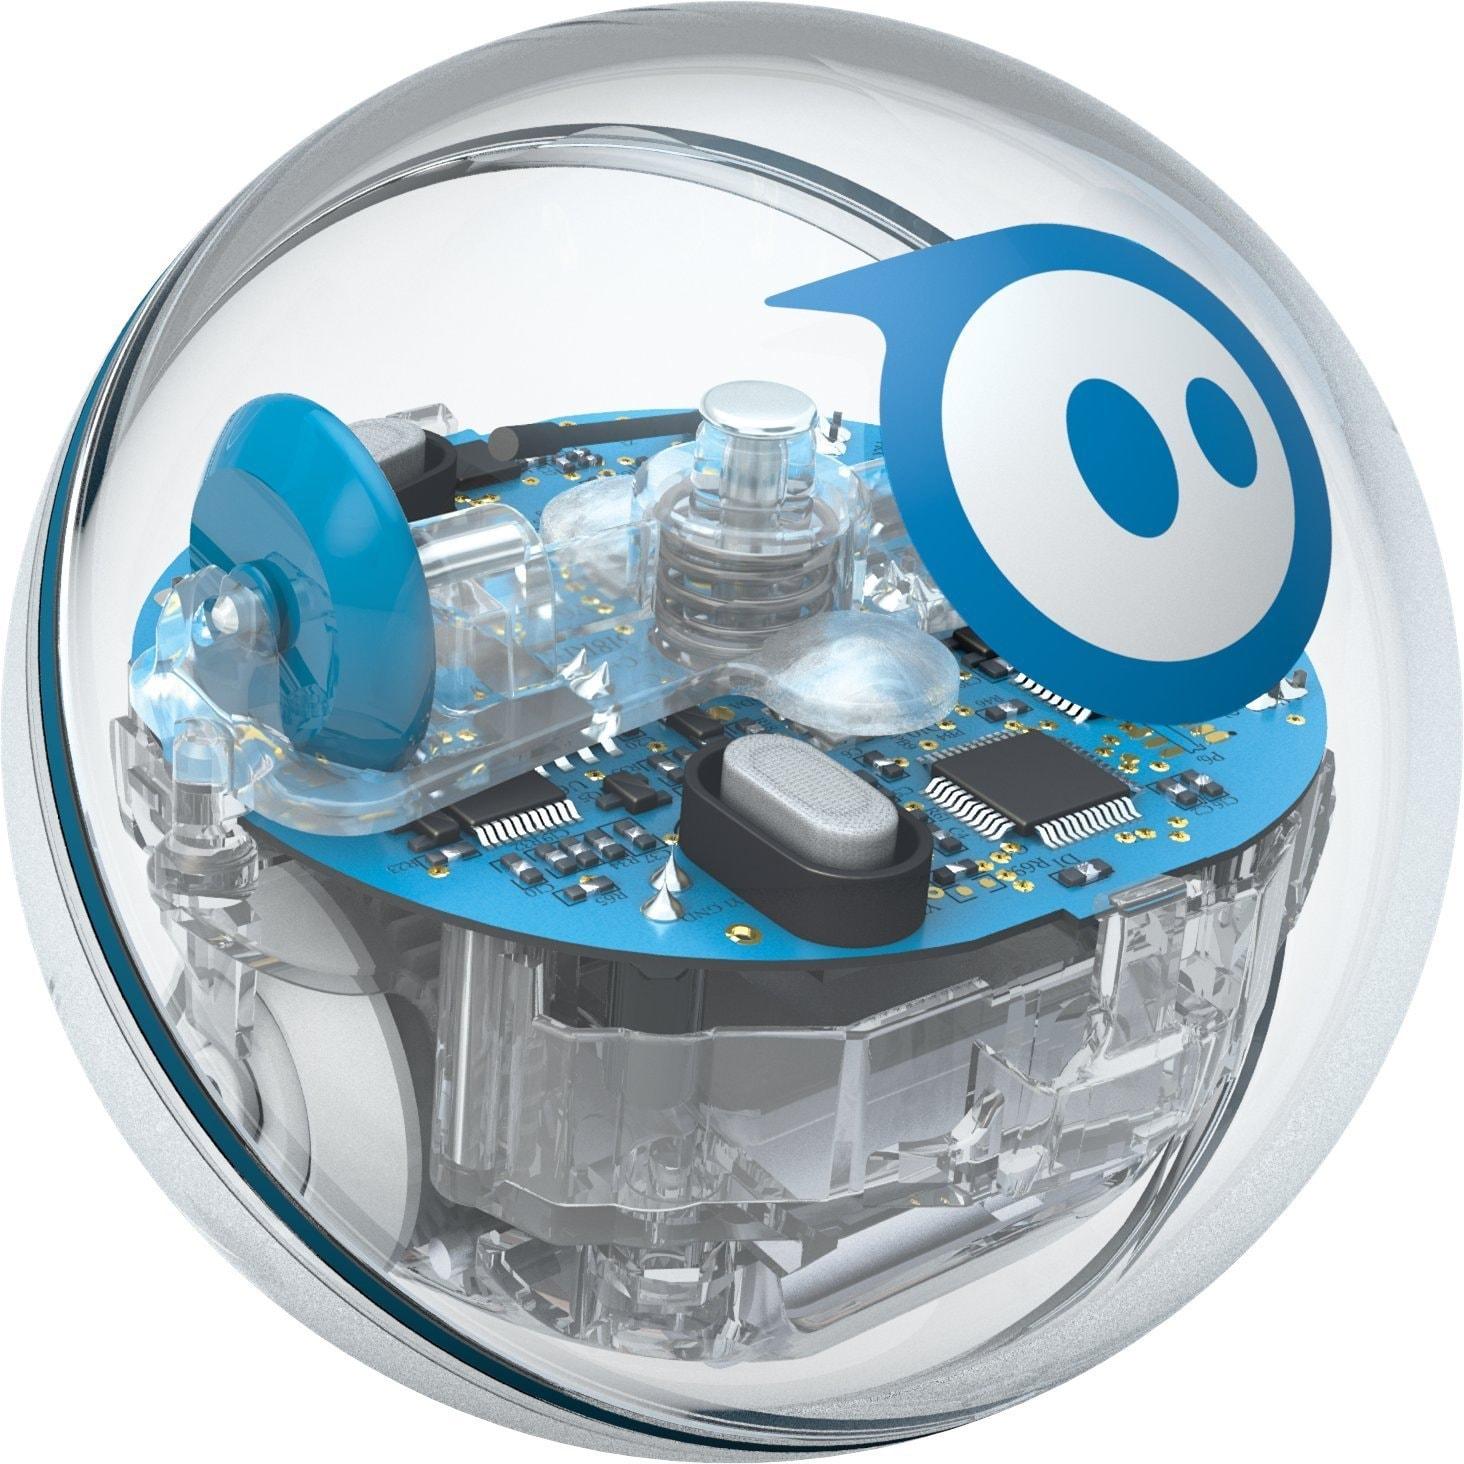 Беспроводной робо-шар Sphero SPRK+ в пластиковом корпусе